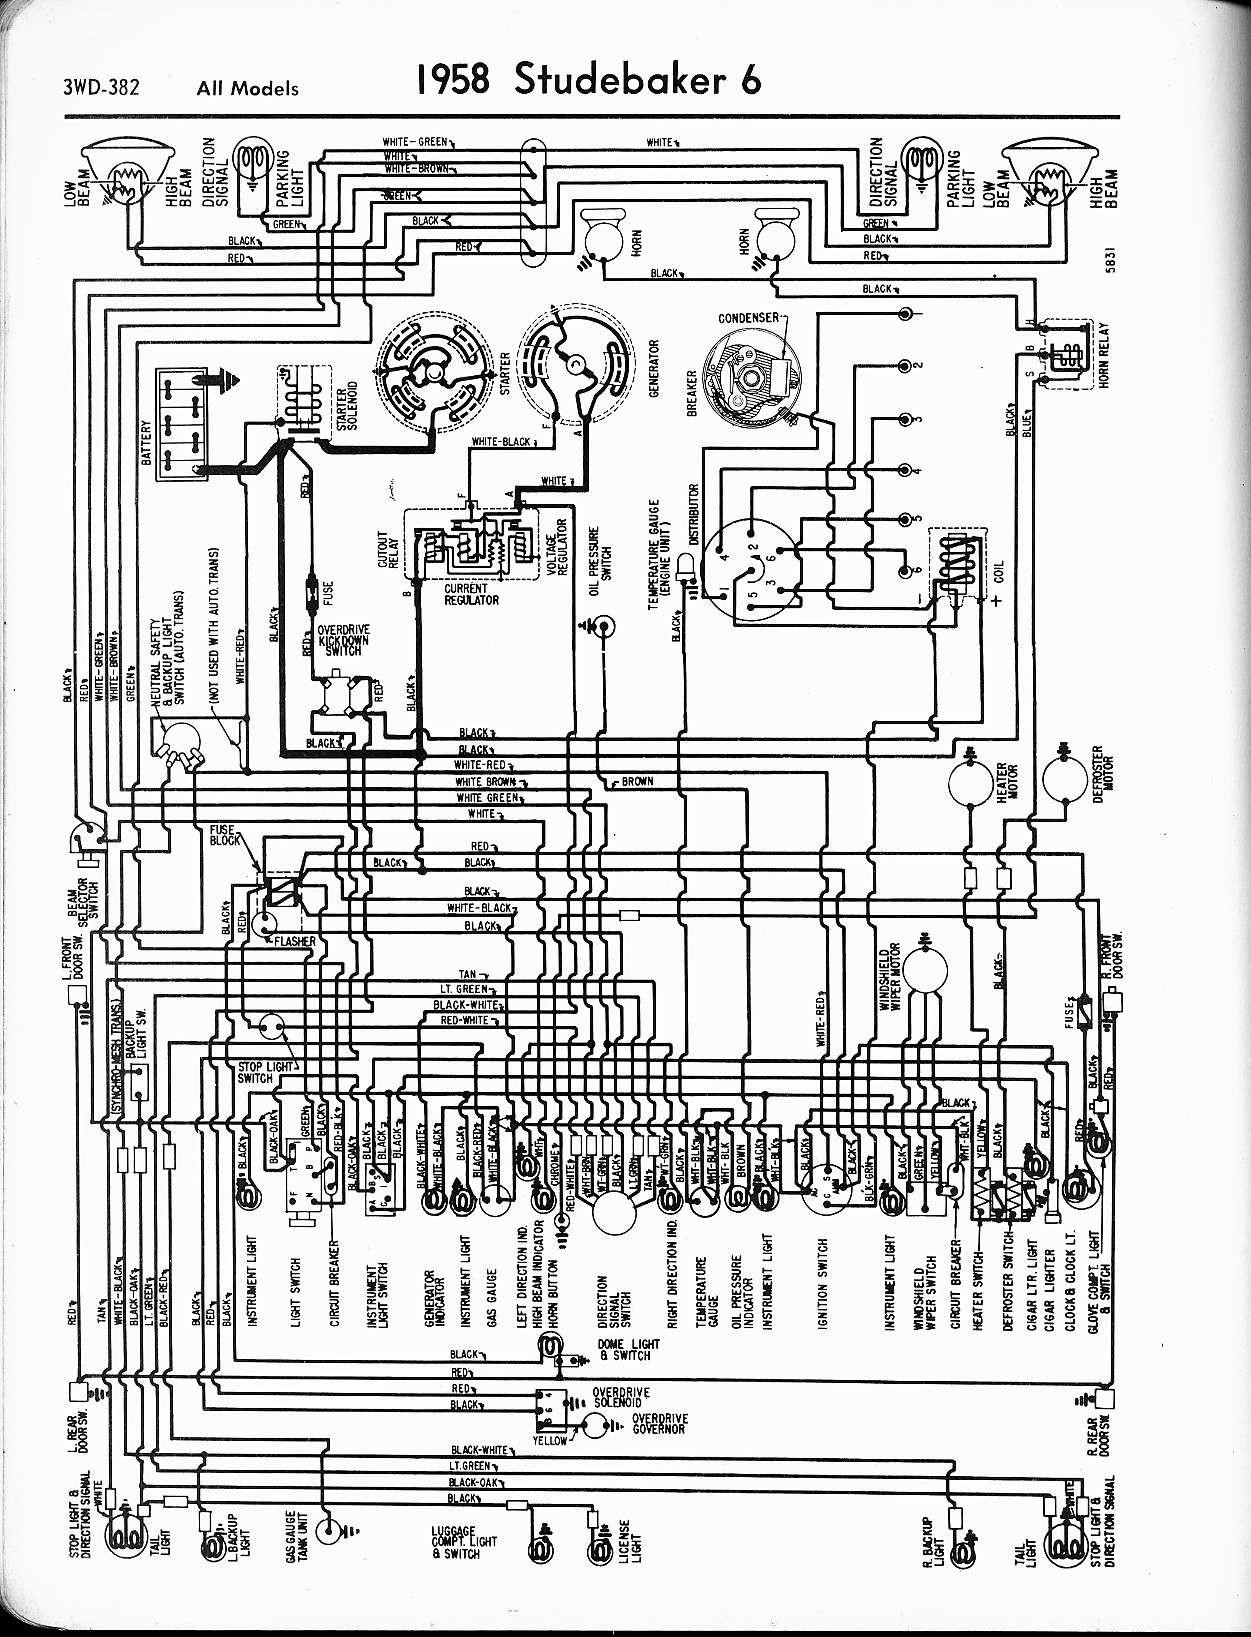 hight resolution of 1950 studebaker wiring diagram wiring diagram for you1950 studebaker champion wiring diagram wiring library 1950 studebaker